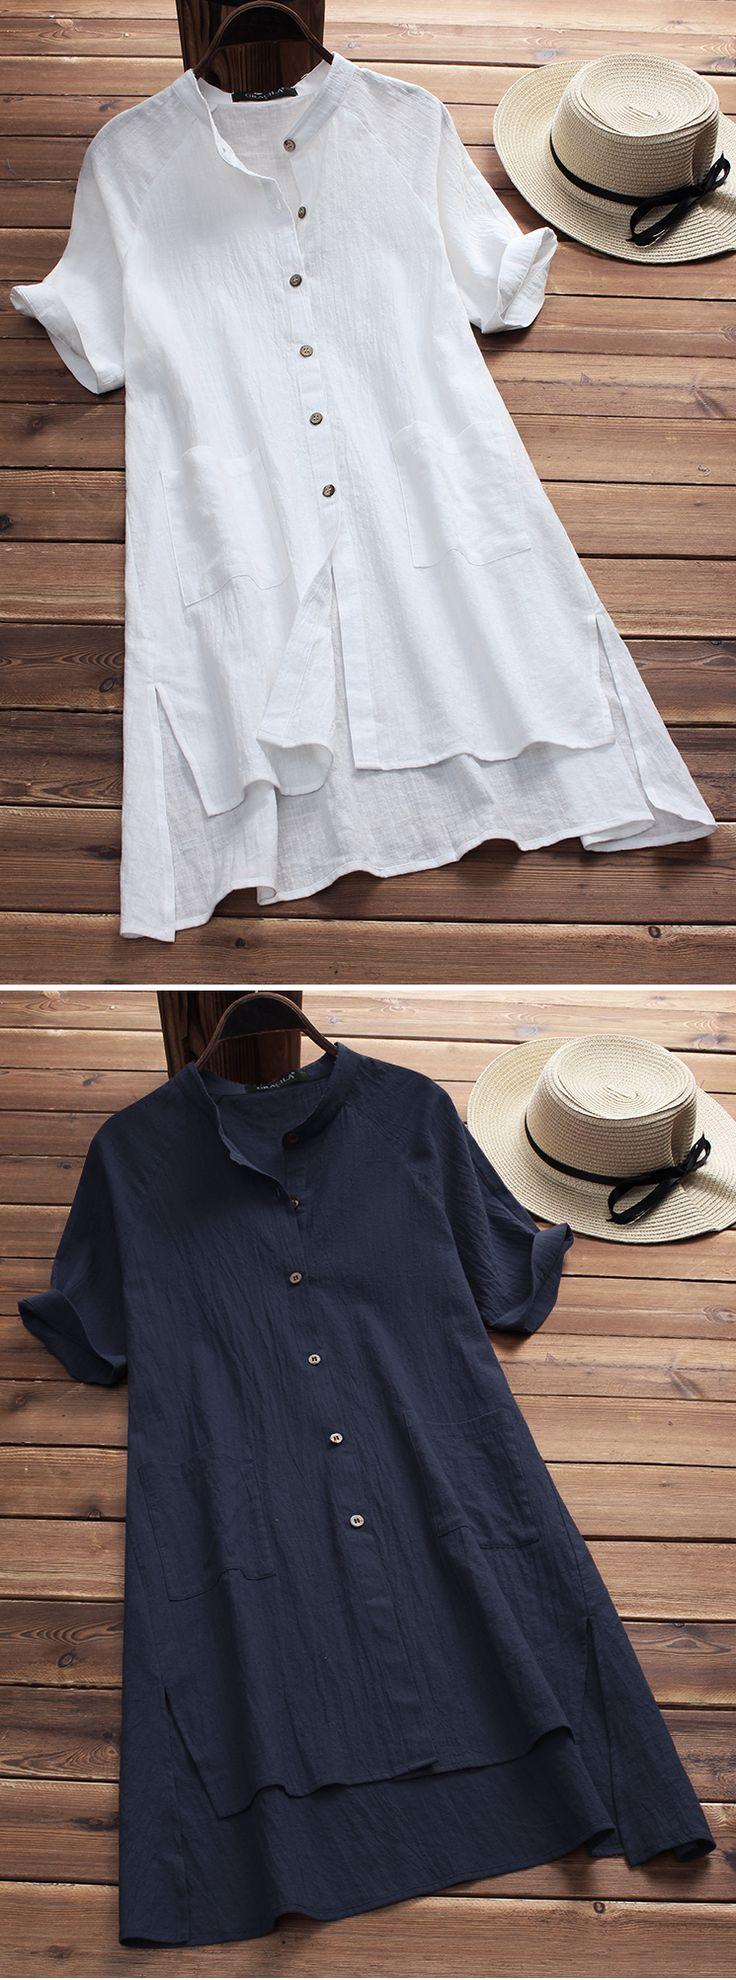 UP TO 50% OFF! Vintage Pure Color Irregular Hem Short Sleeve Women Blouses. SHOP NOW!